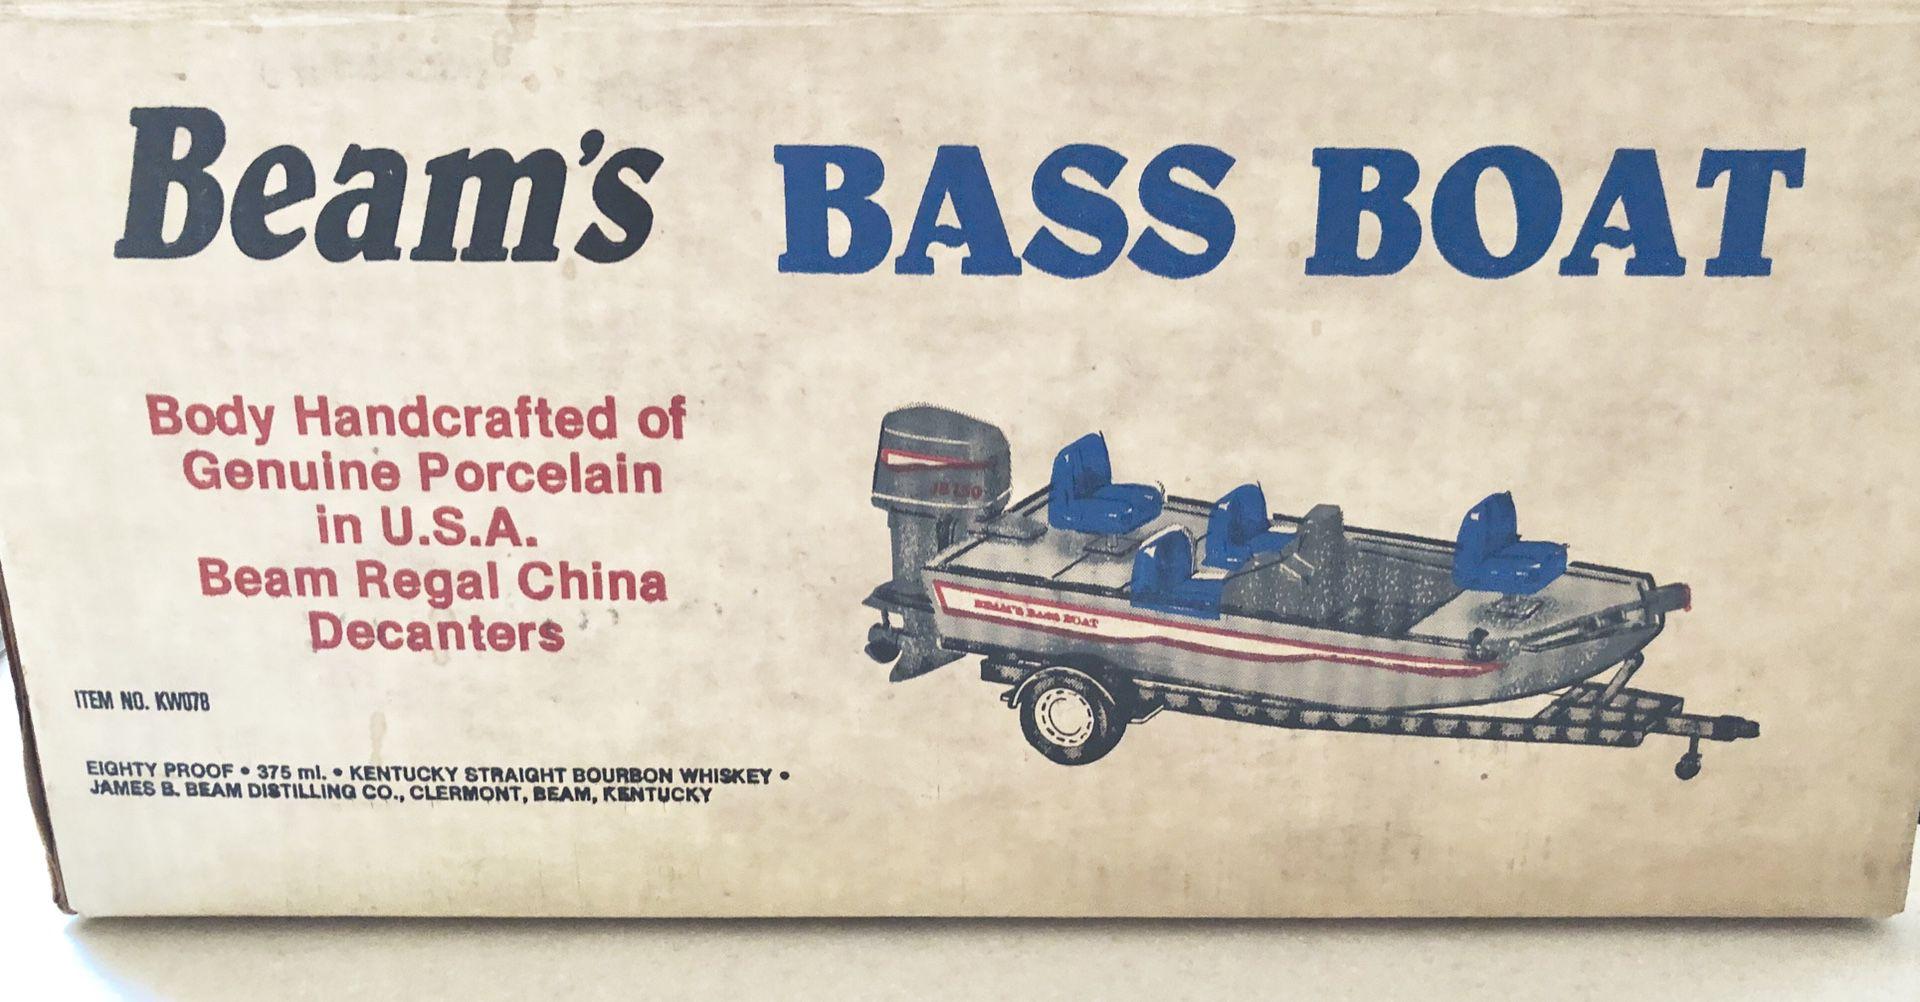 BEAM'S BASS BOAT WITH TRAILER JIM BEAM 1987